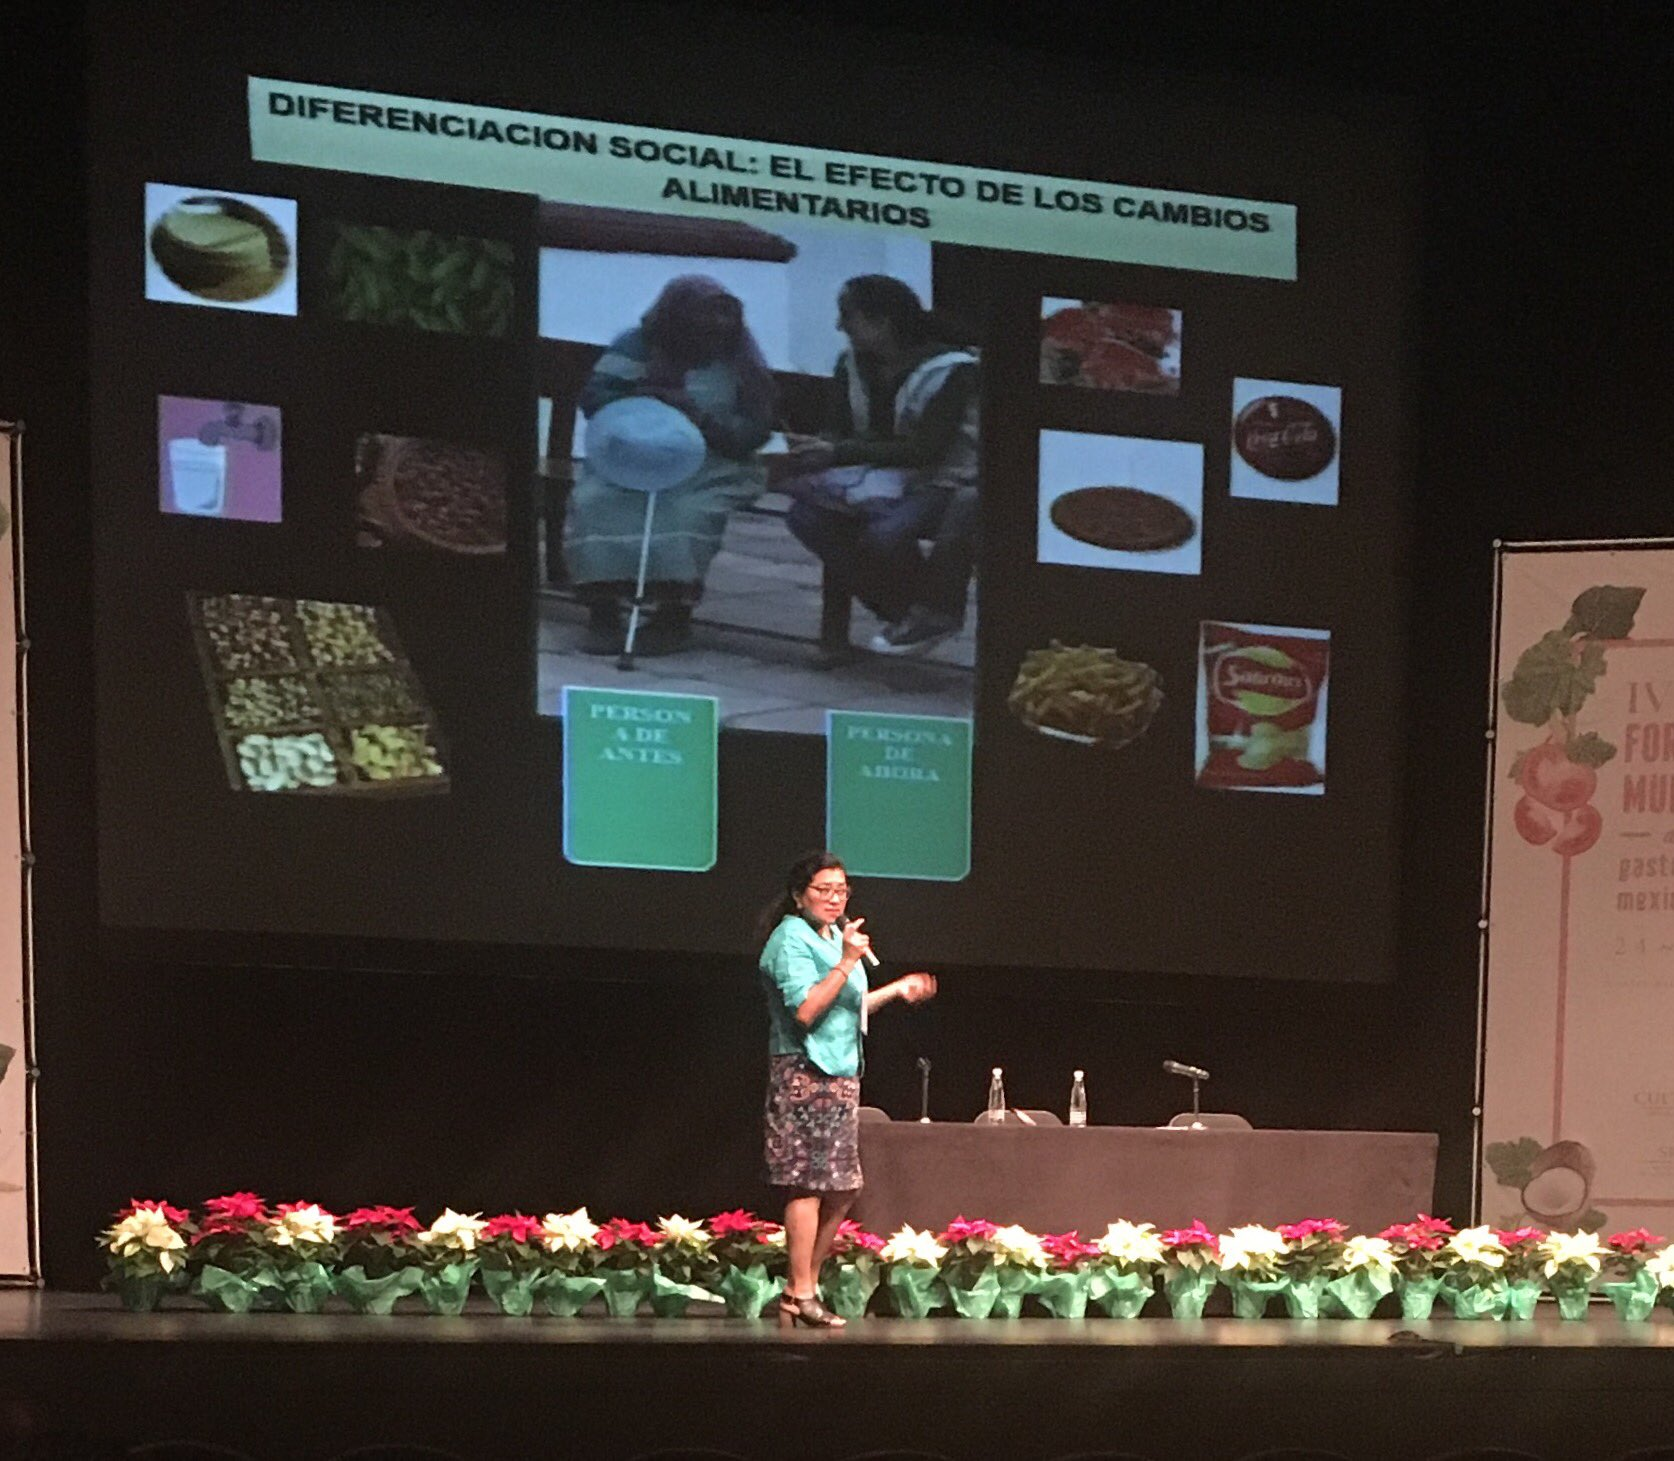 Cambios alimentarios: alimentación de antes/alimentación de ahora: hay que valorar los alimentos tradicionales #FMGM16 https://t.co/mrBavSnsHN